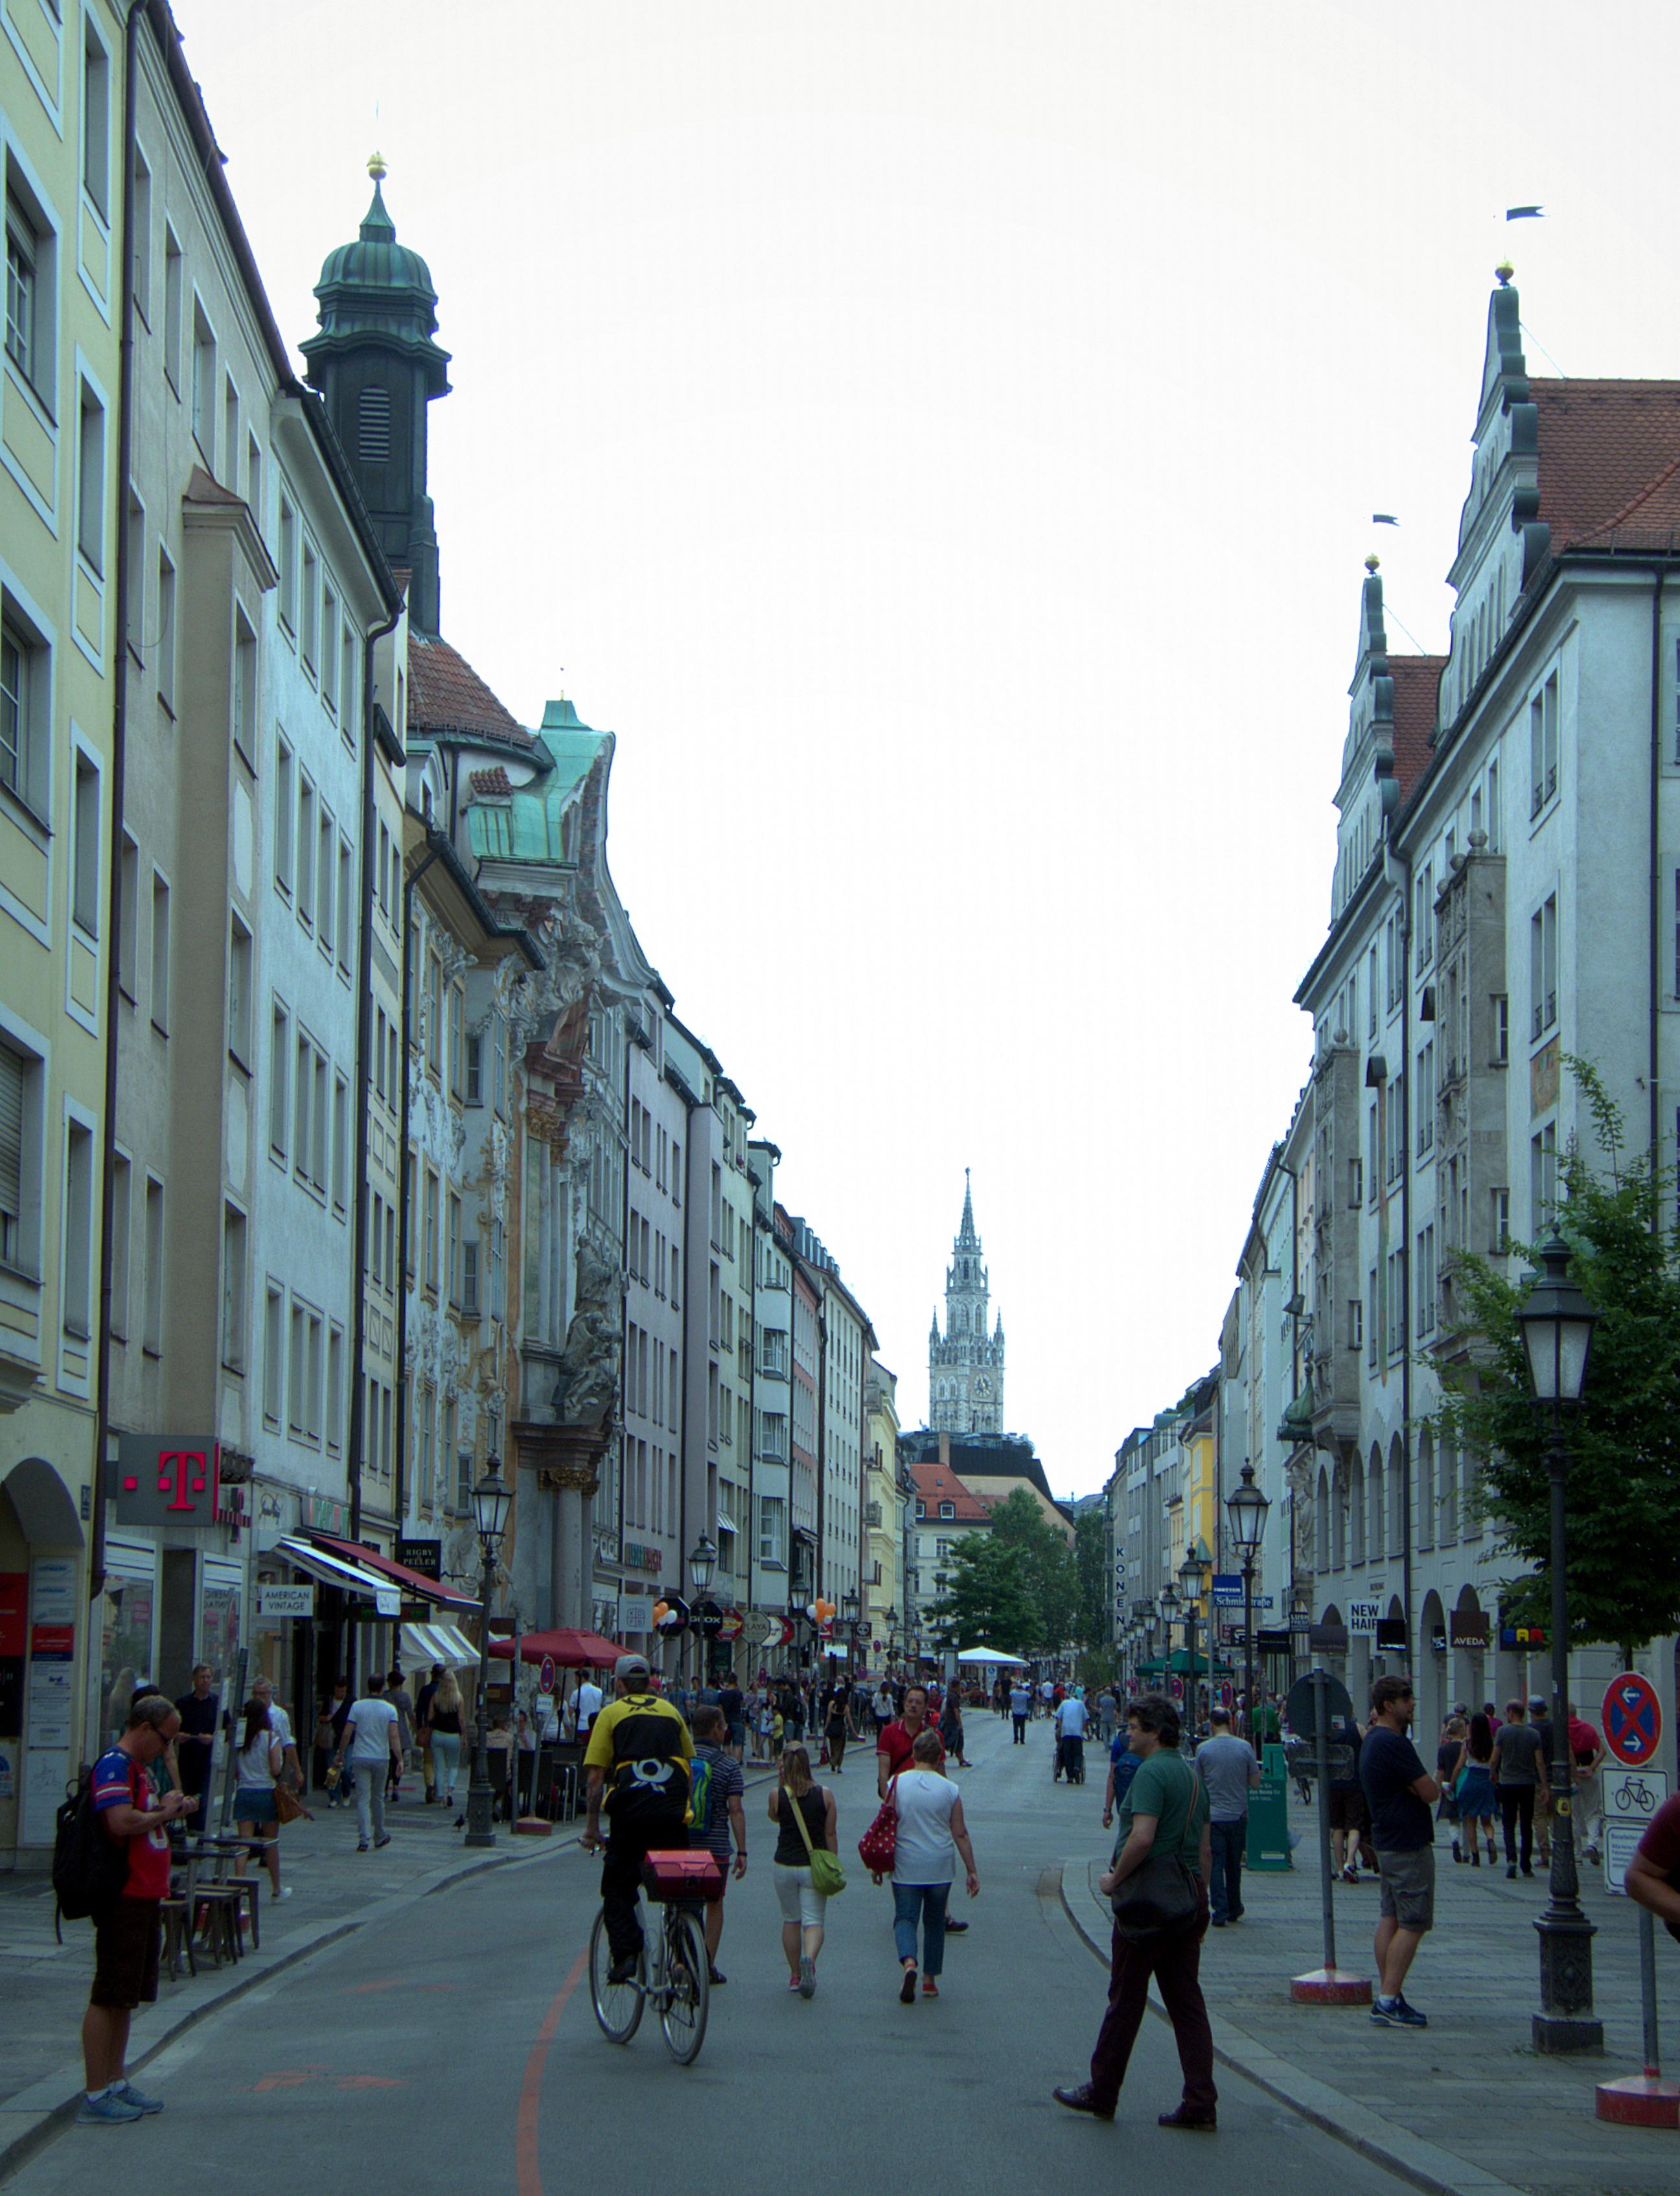 00fedb3f7f File Sendlinger Straße Fußgängerzone.jpg - Wikimedia Commons